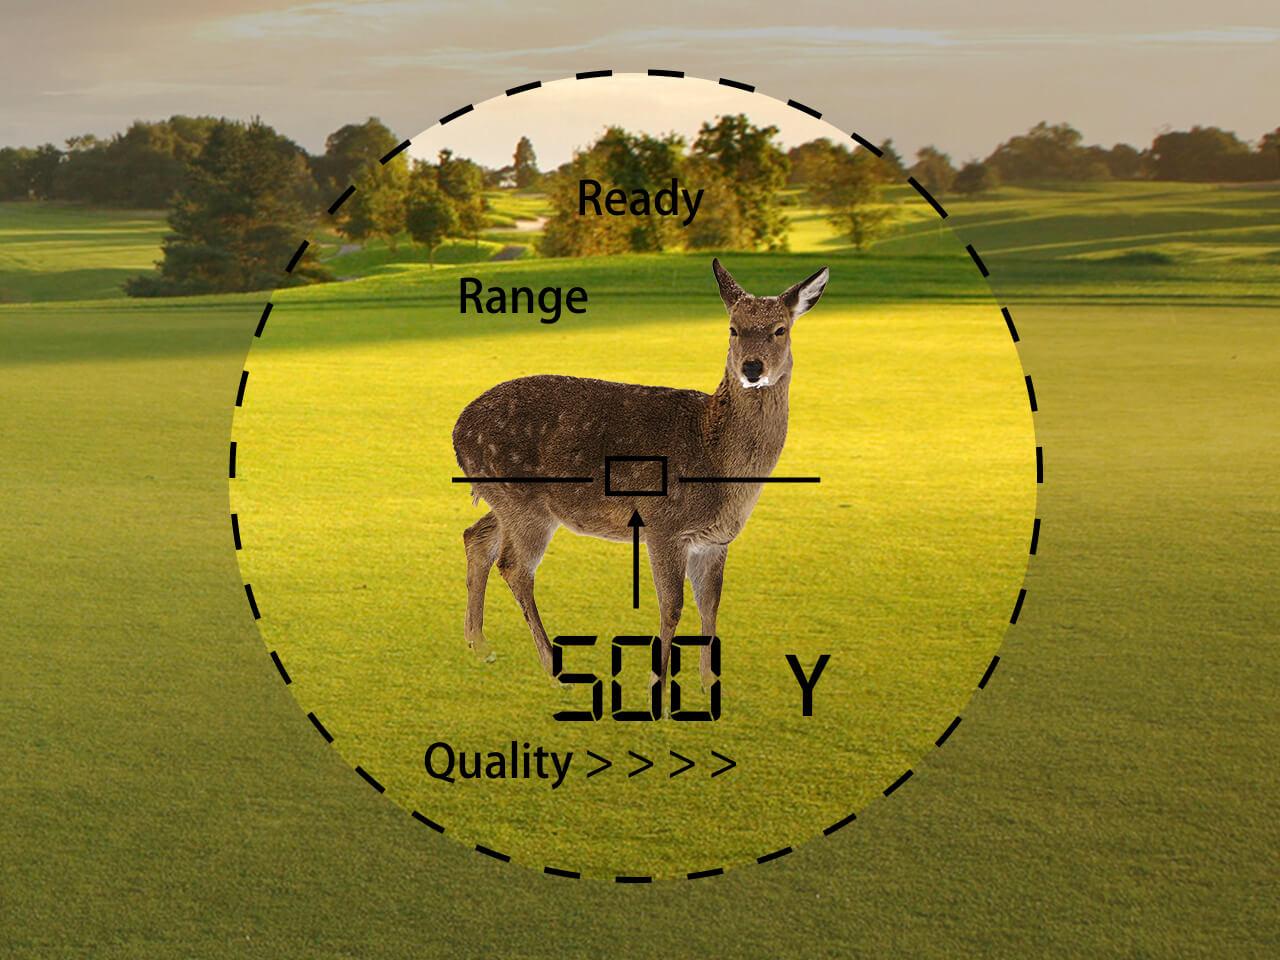 TecTecTec hunting precision laser rangefinder PROWILD 540 Yard measurement 1 Yard precision